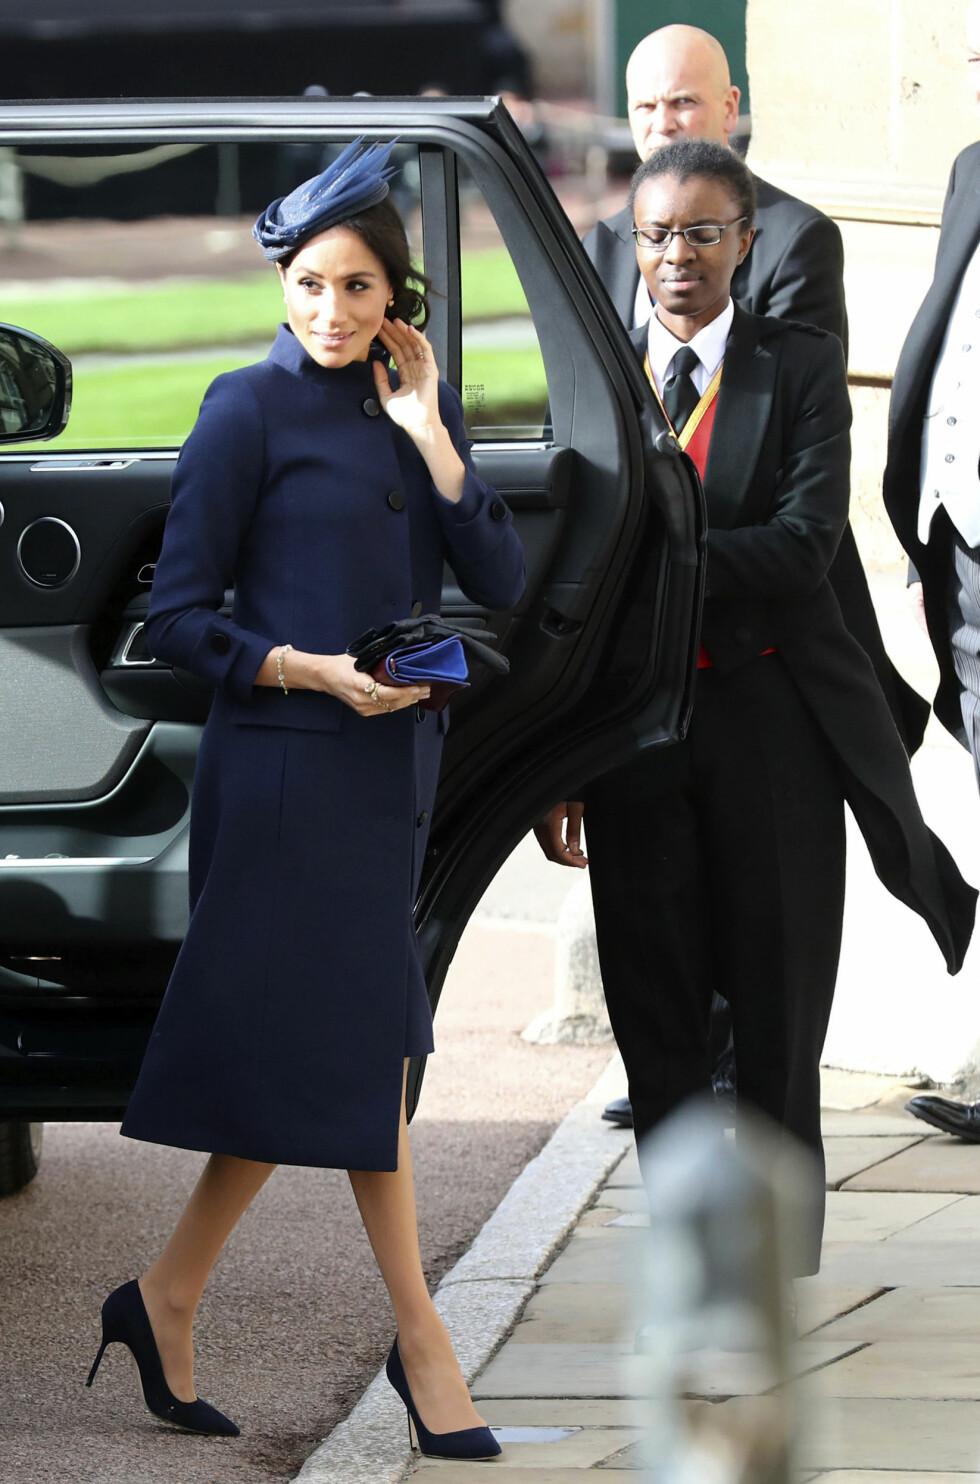 I BRYLLUP: 12. oktober var det duket for bryllup mellom prins Harrys kusine prinsesse Eugenie og Jack Brooksbank. Hertuginne Meghan bar en fotsid kåpe. FOTO: NTB Scanpix